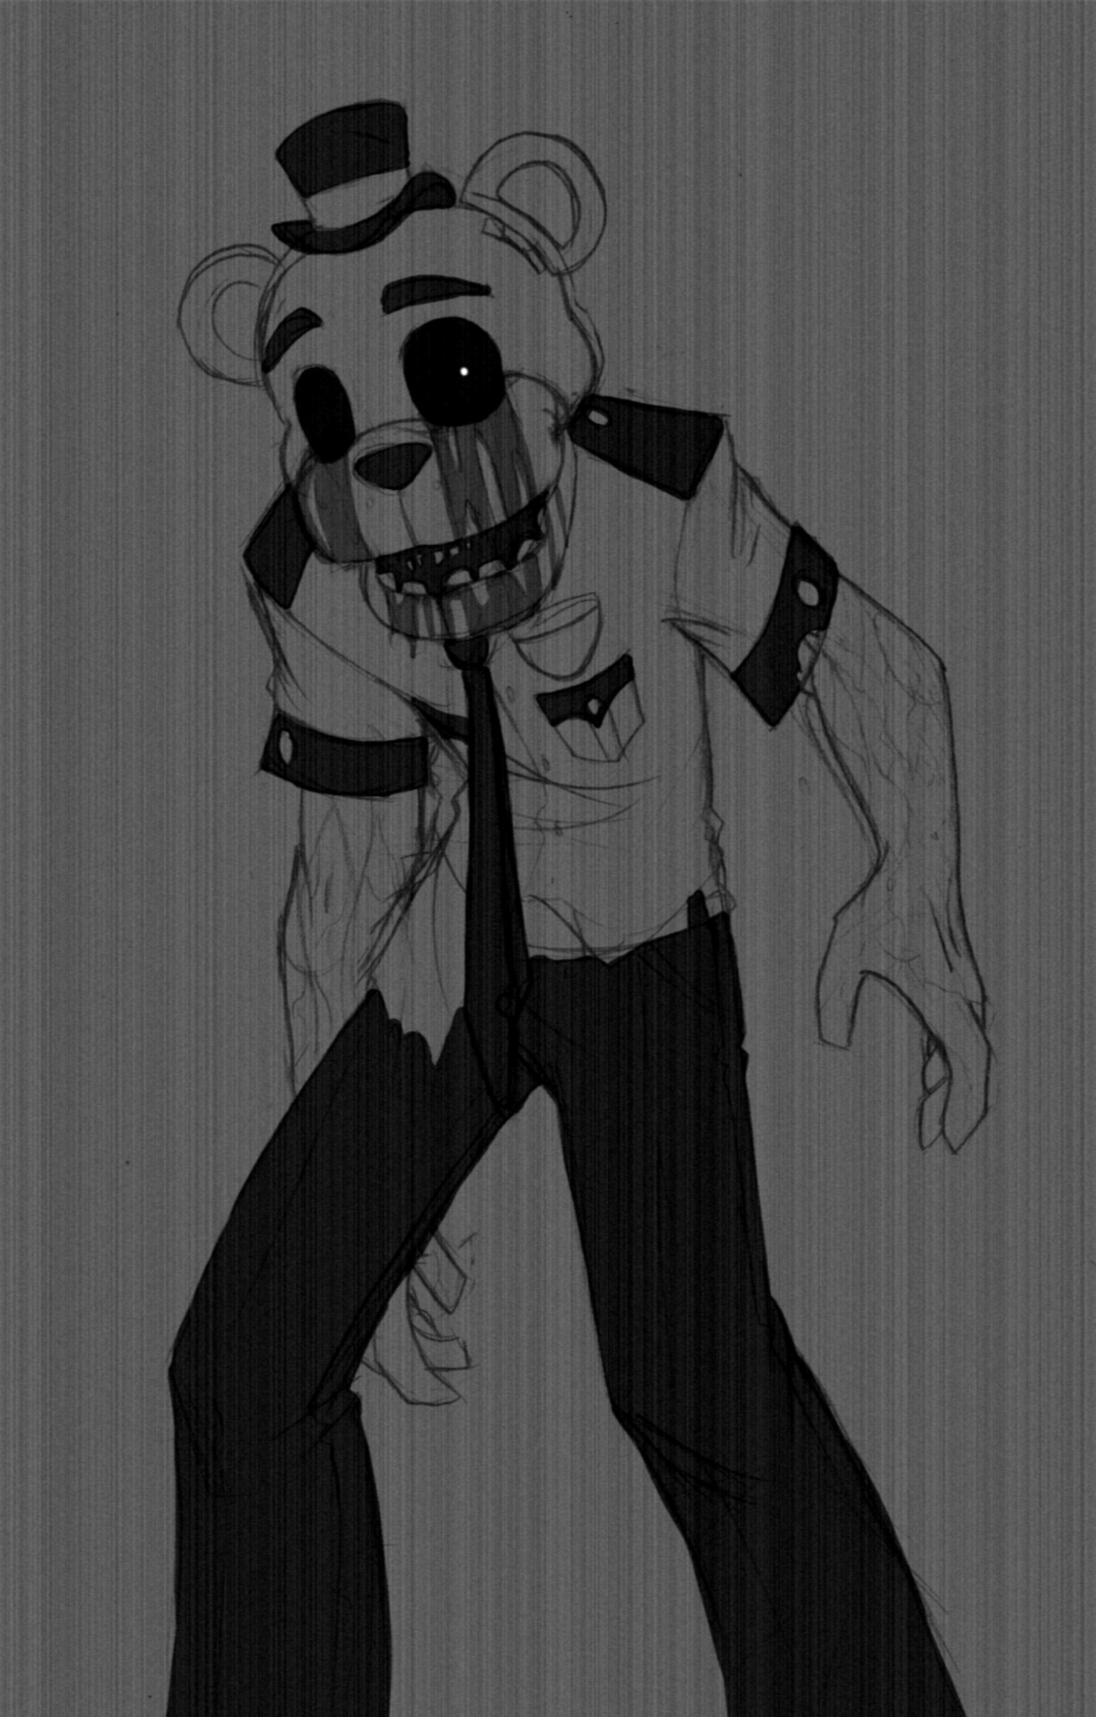 Grey Freddy everyone, nothing special, i just felt like drawing him.